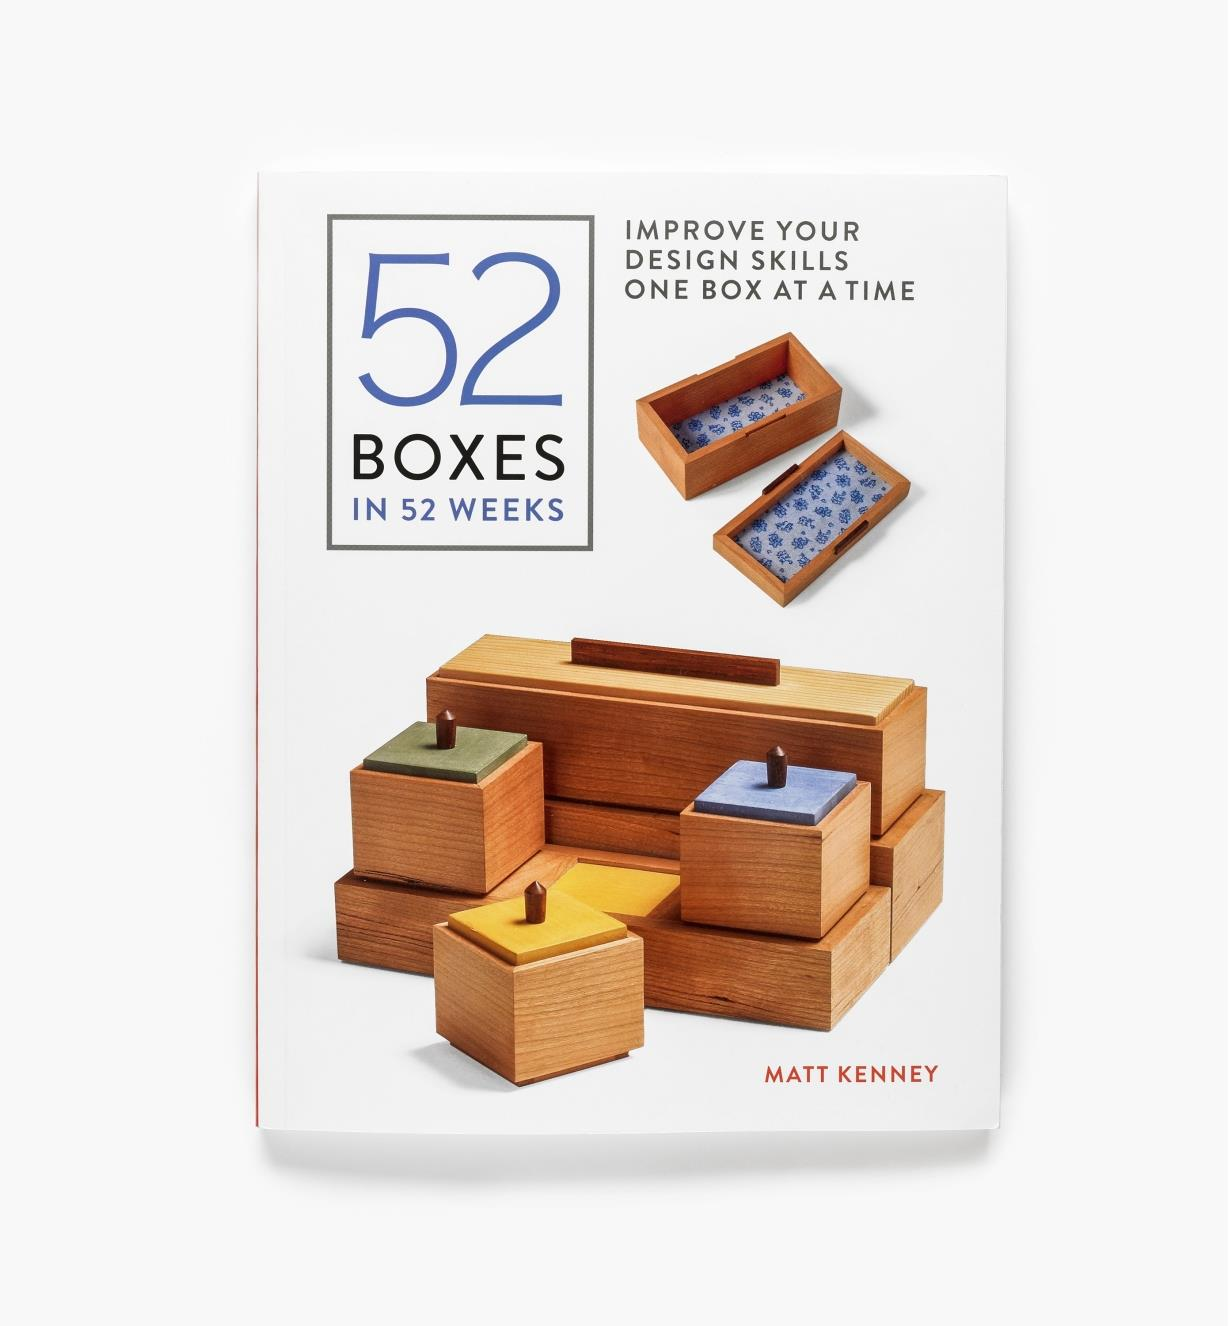 73L0131 - 52 Boxes in 52 Weeks